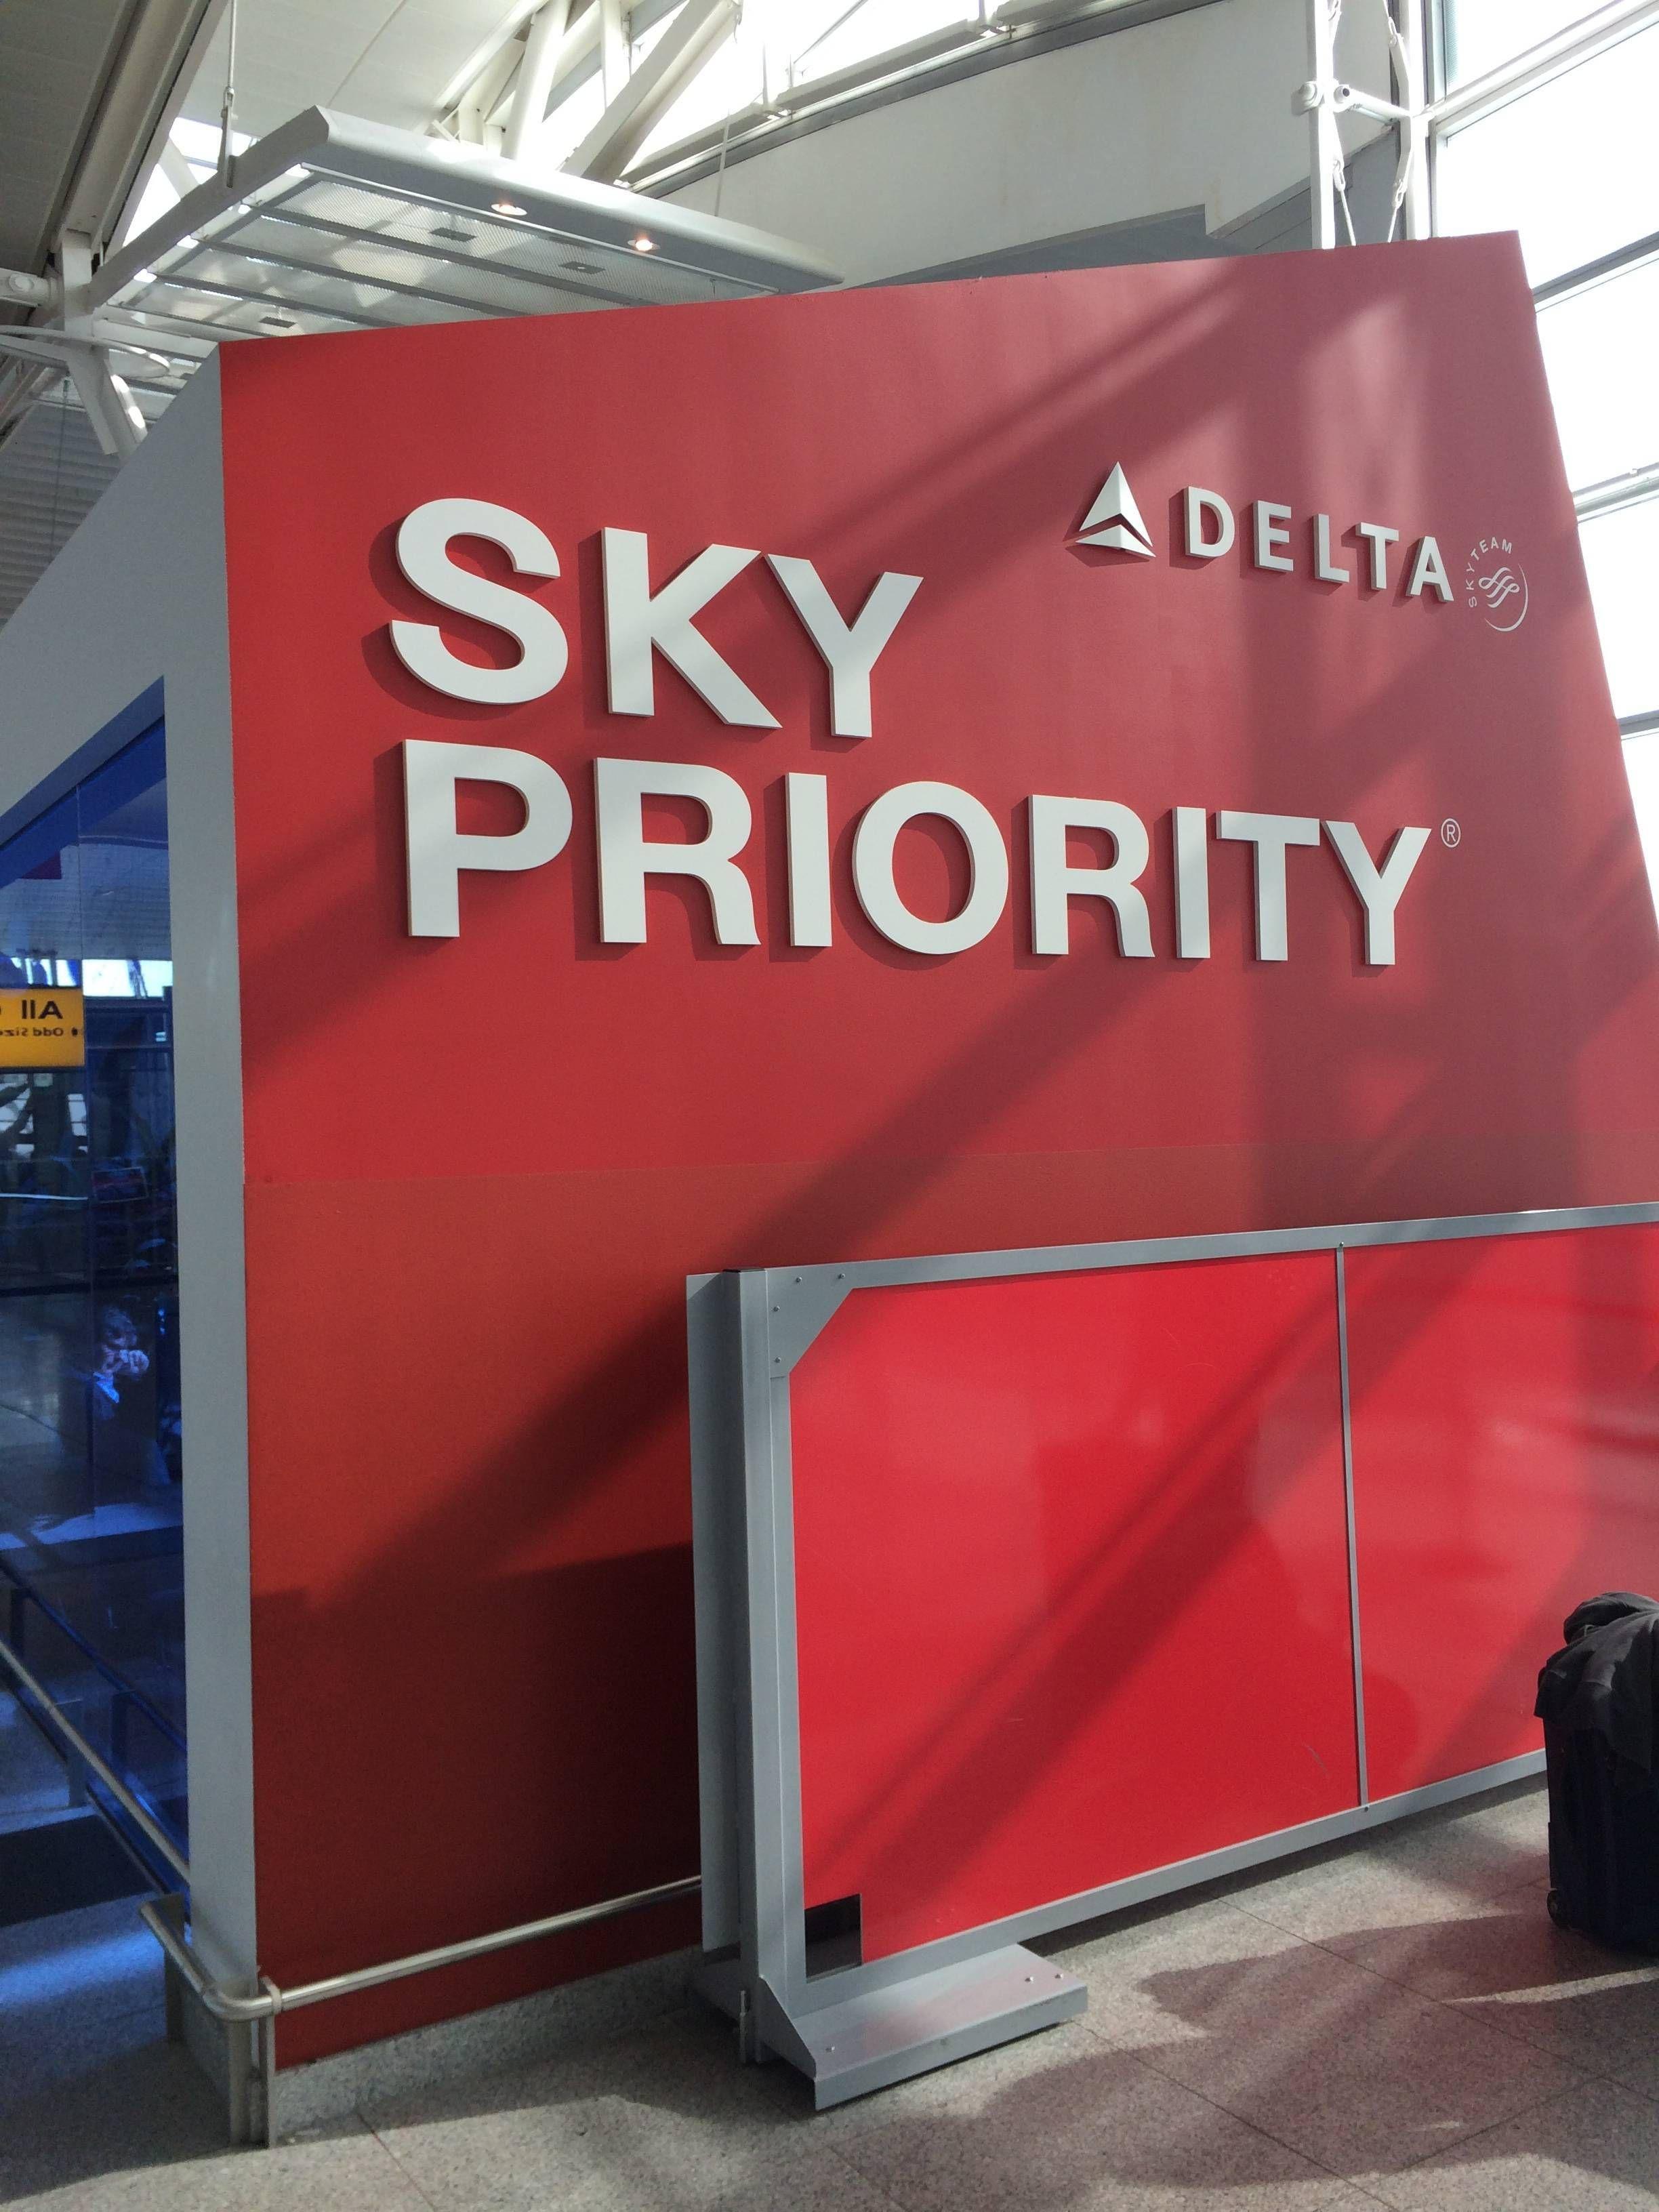 delta skyclub nova york jfk sala vip - passageirodeprimeria